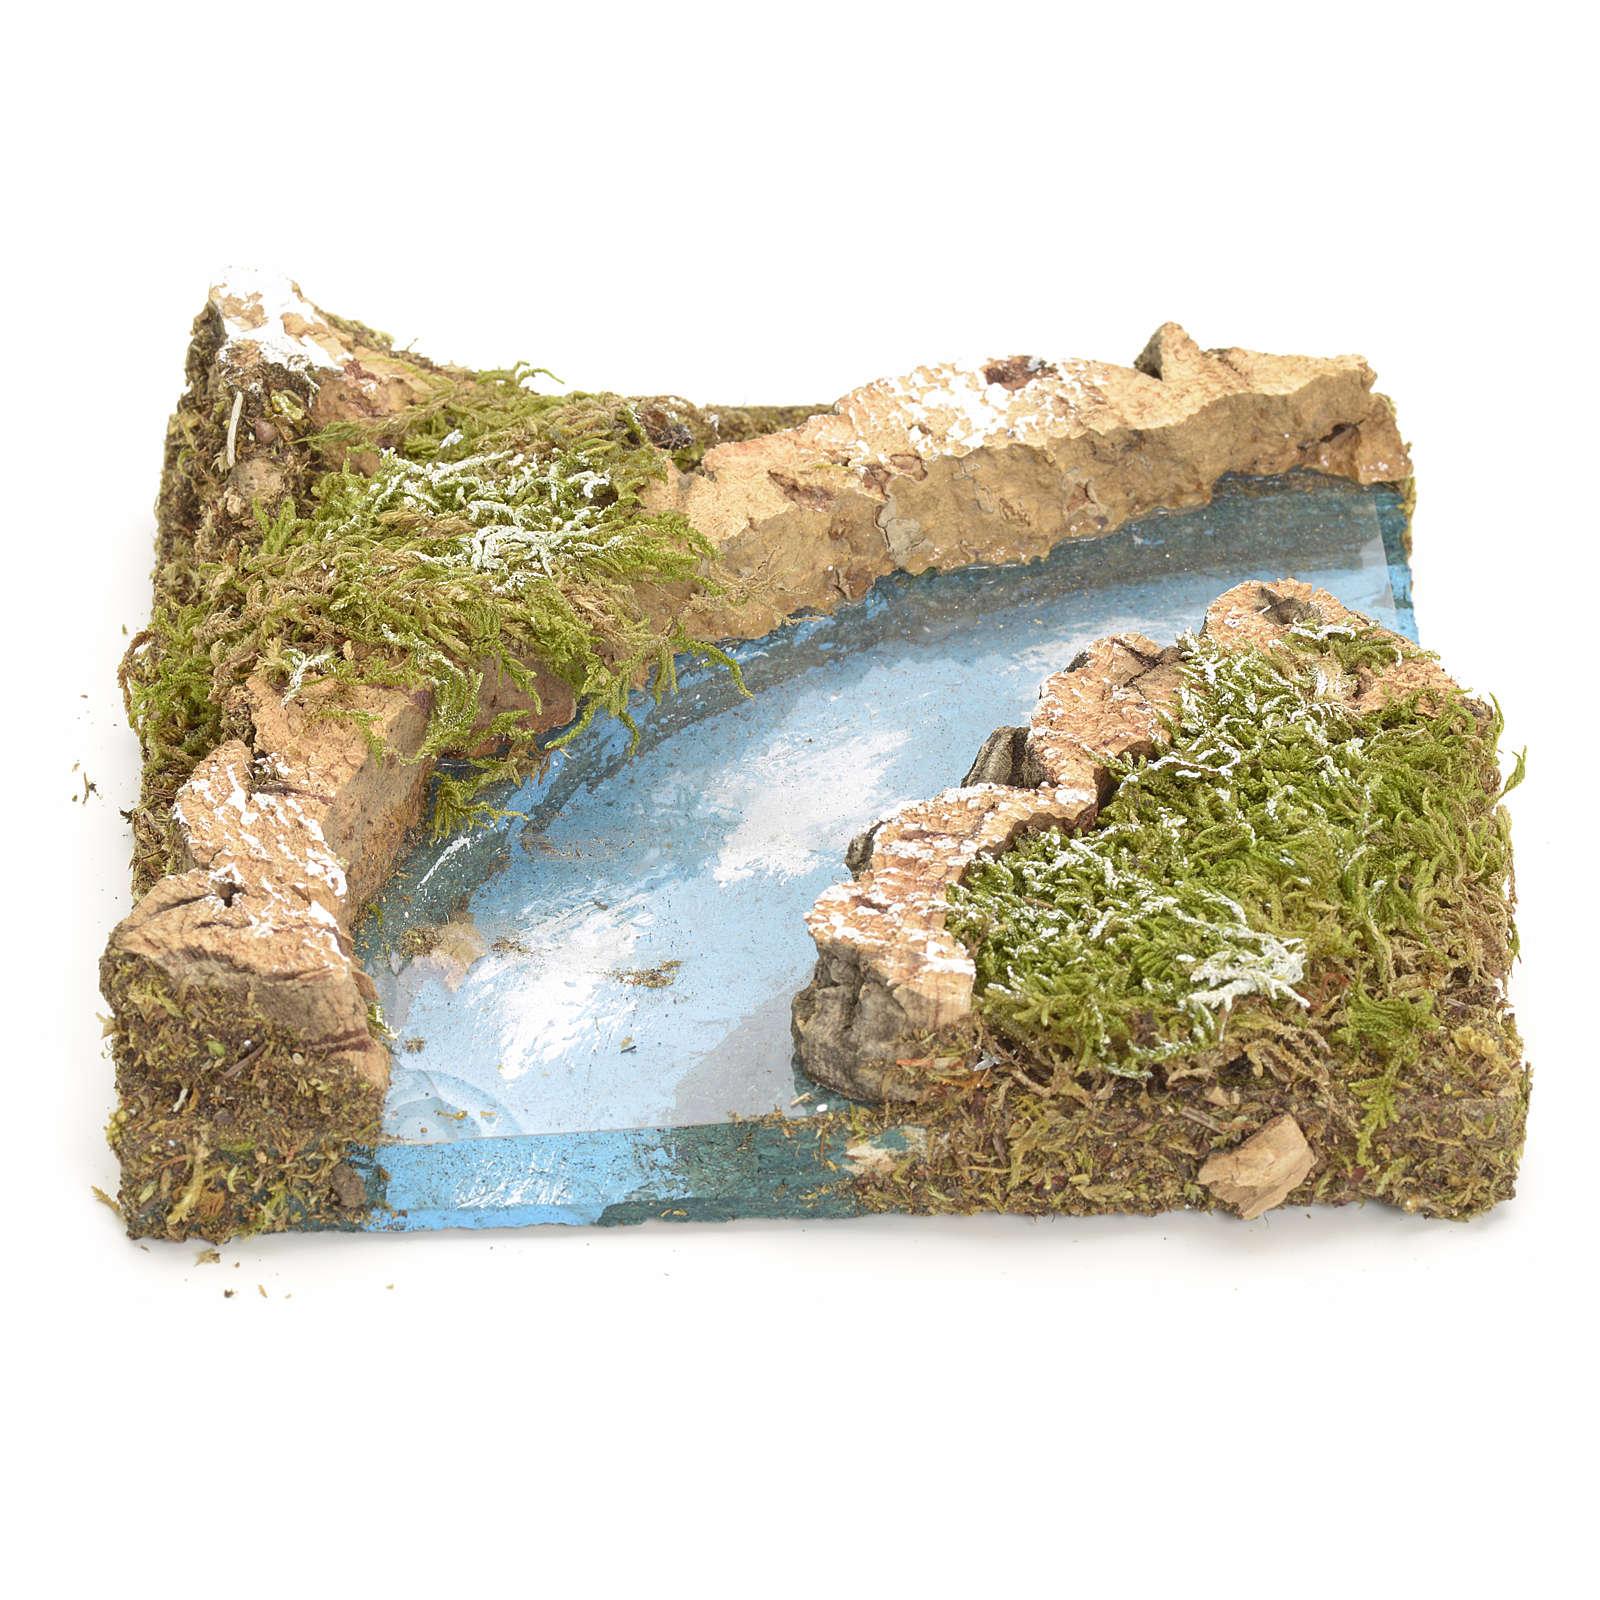 Nativity setting, river turn in cork 4